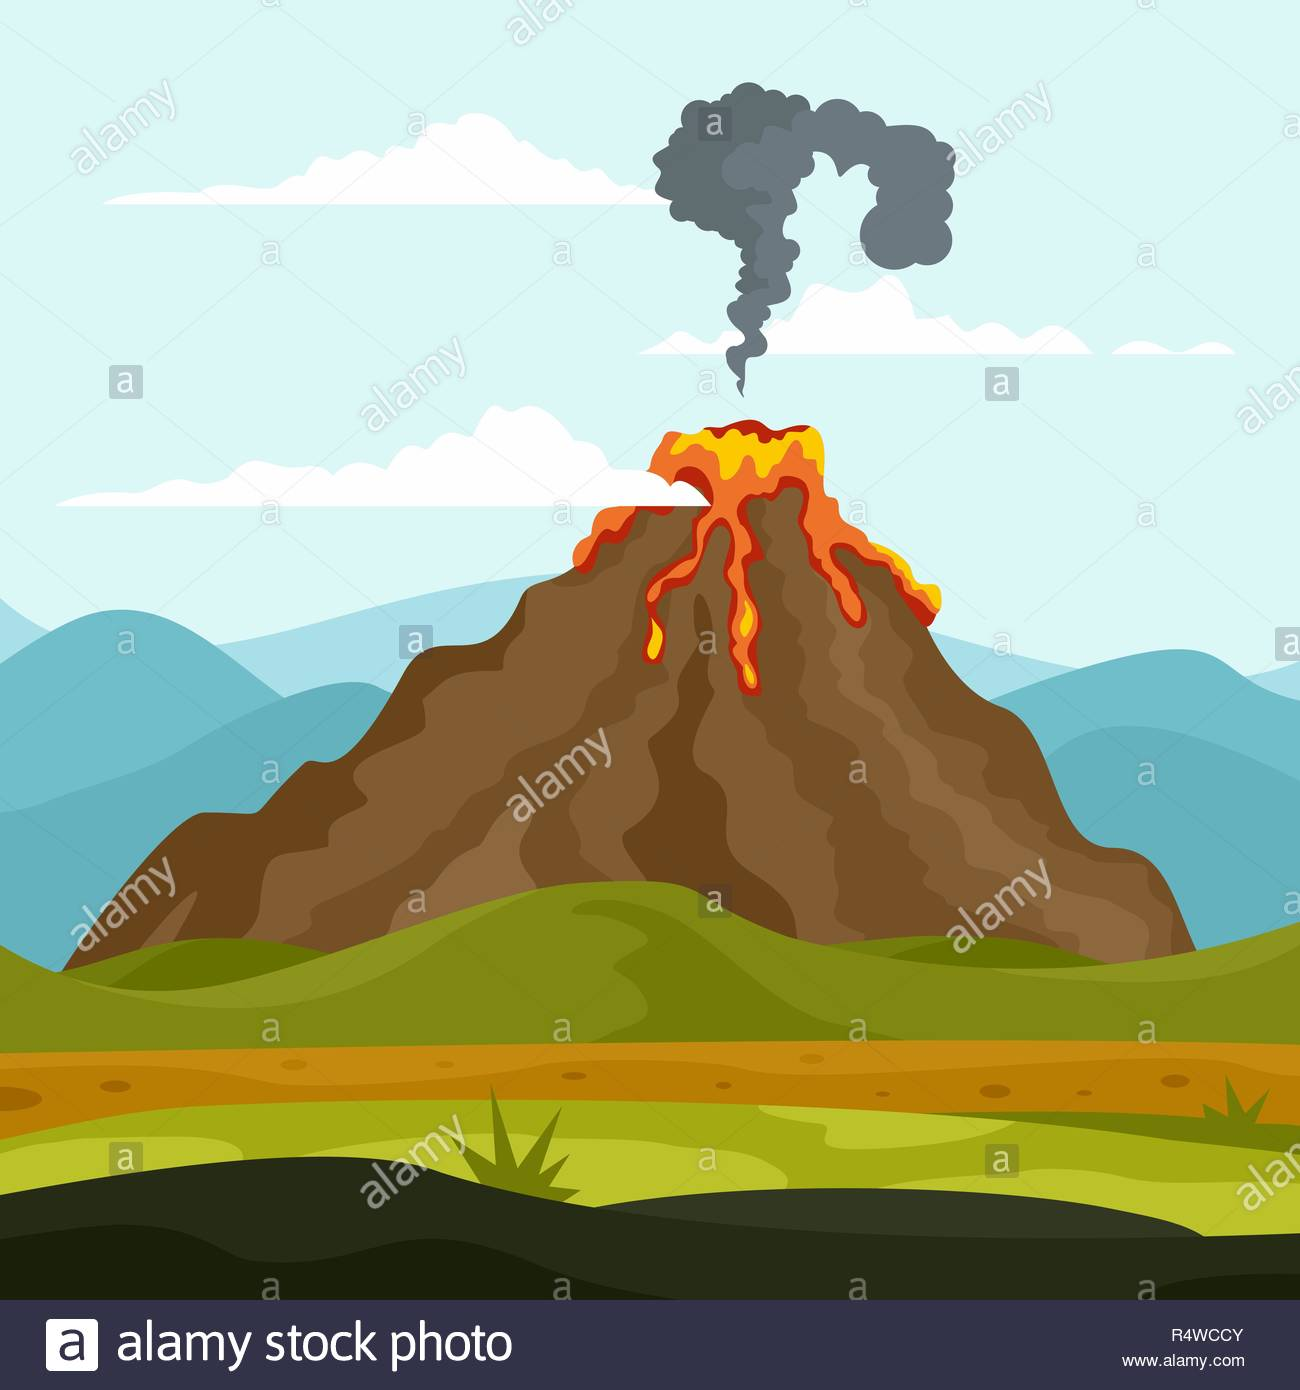 Eruption of volcano background Flat illustration of eruption of 1300x1390